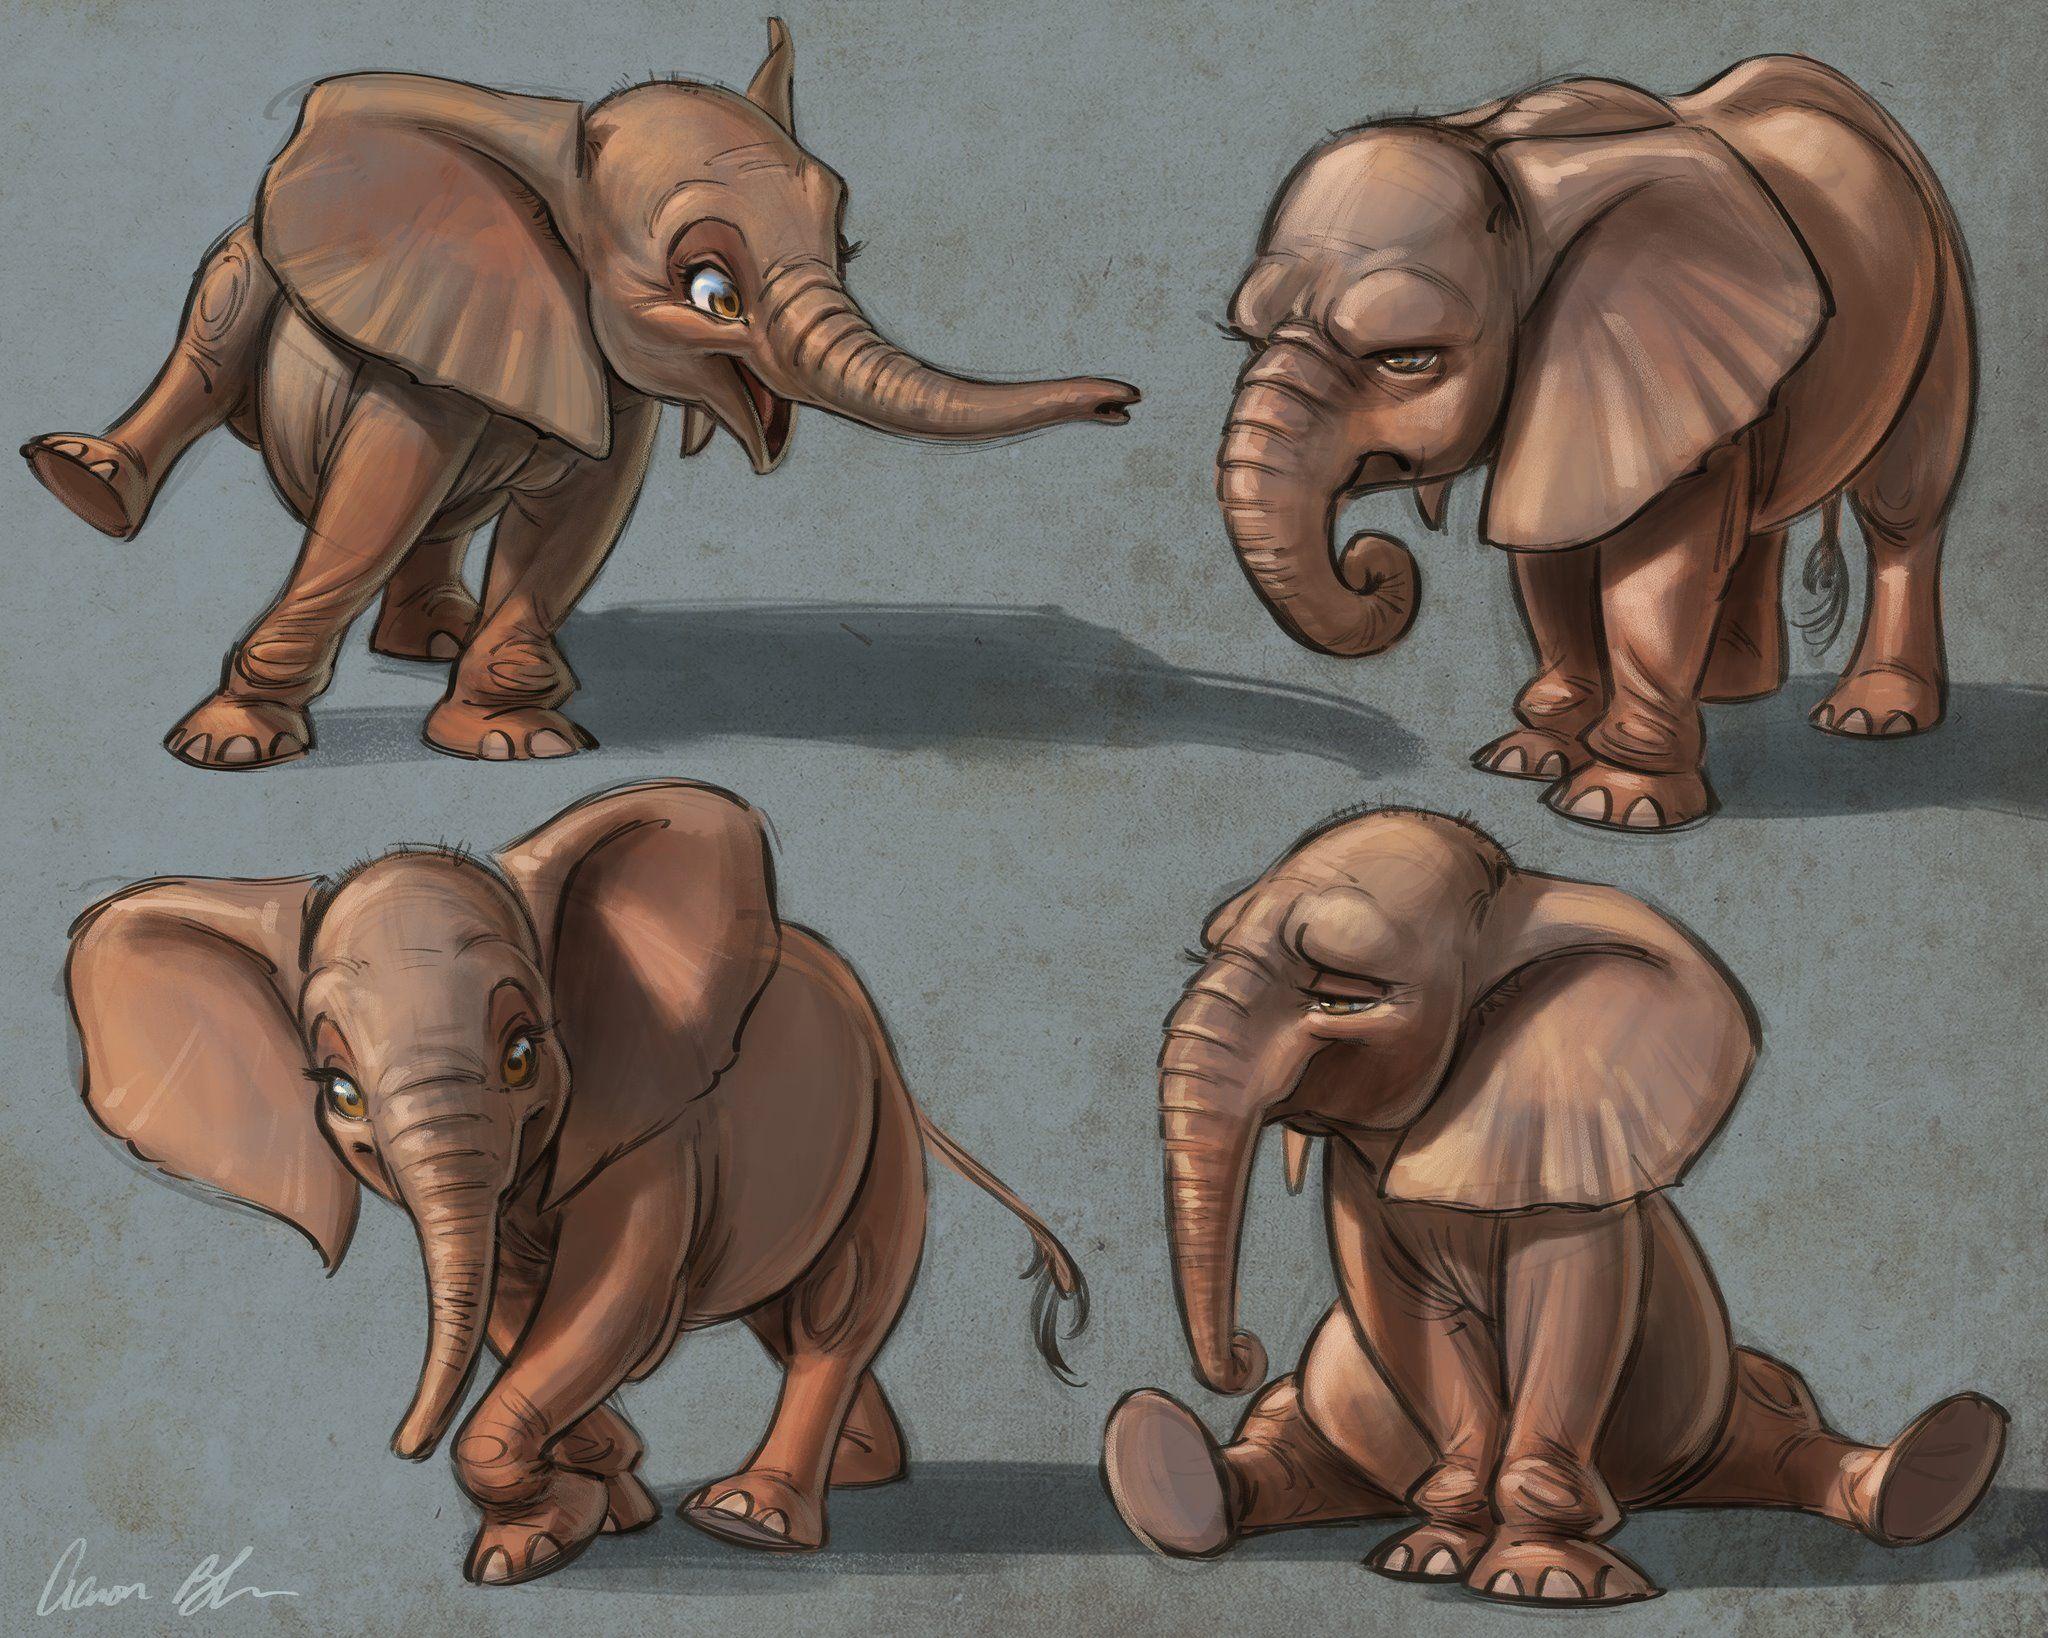 Little elephants by aaron blaise aaron blaiseeee in 2018 pinterest dessin l phant dessin - Dessin elephant ...